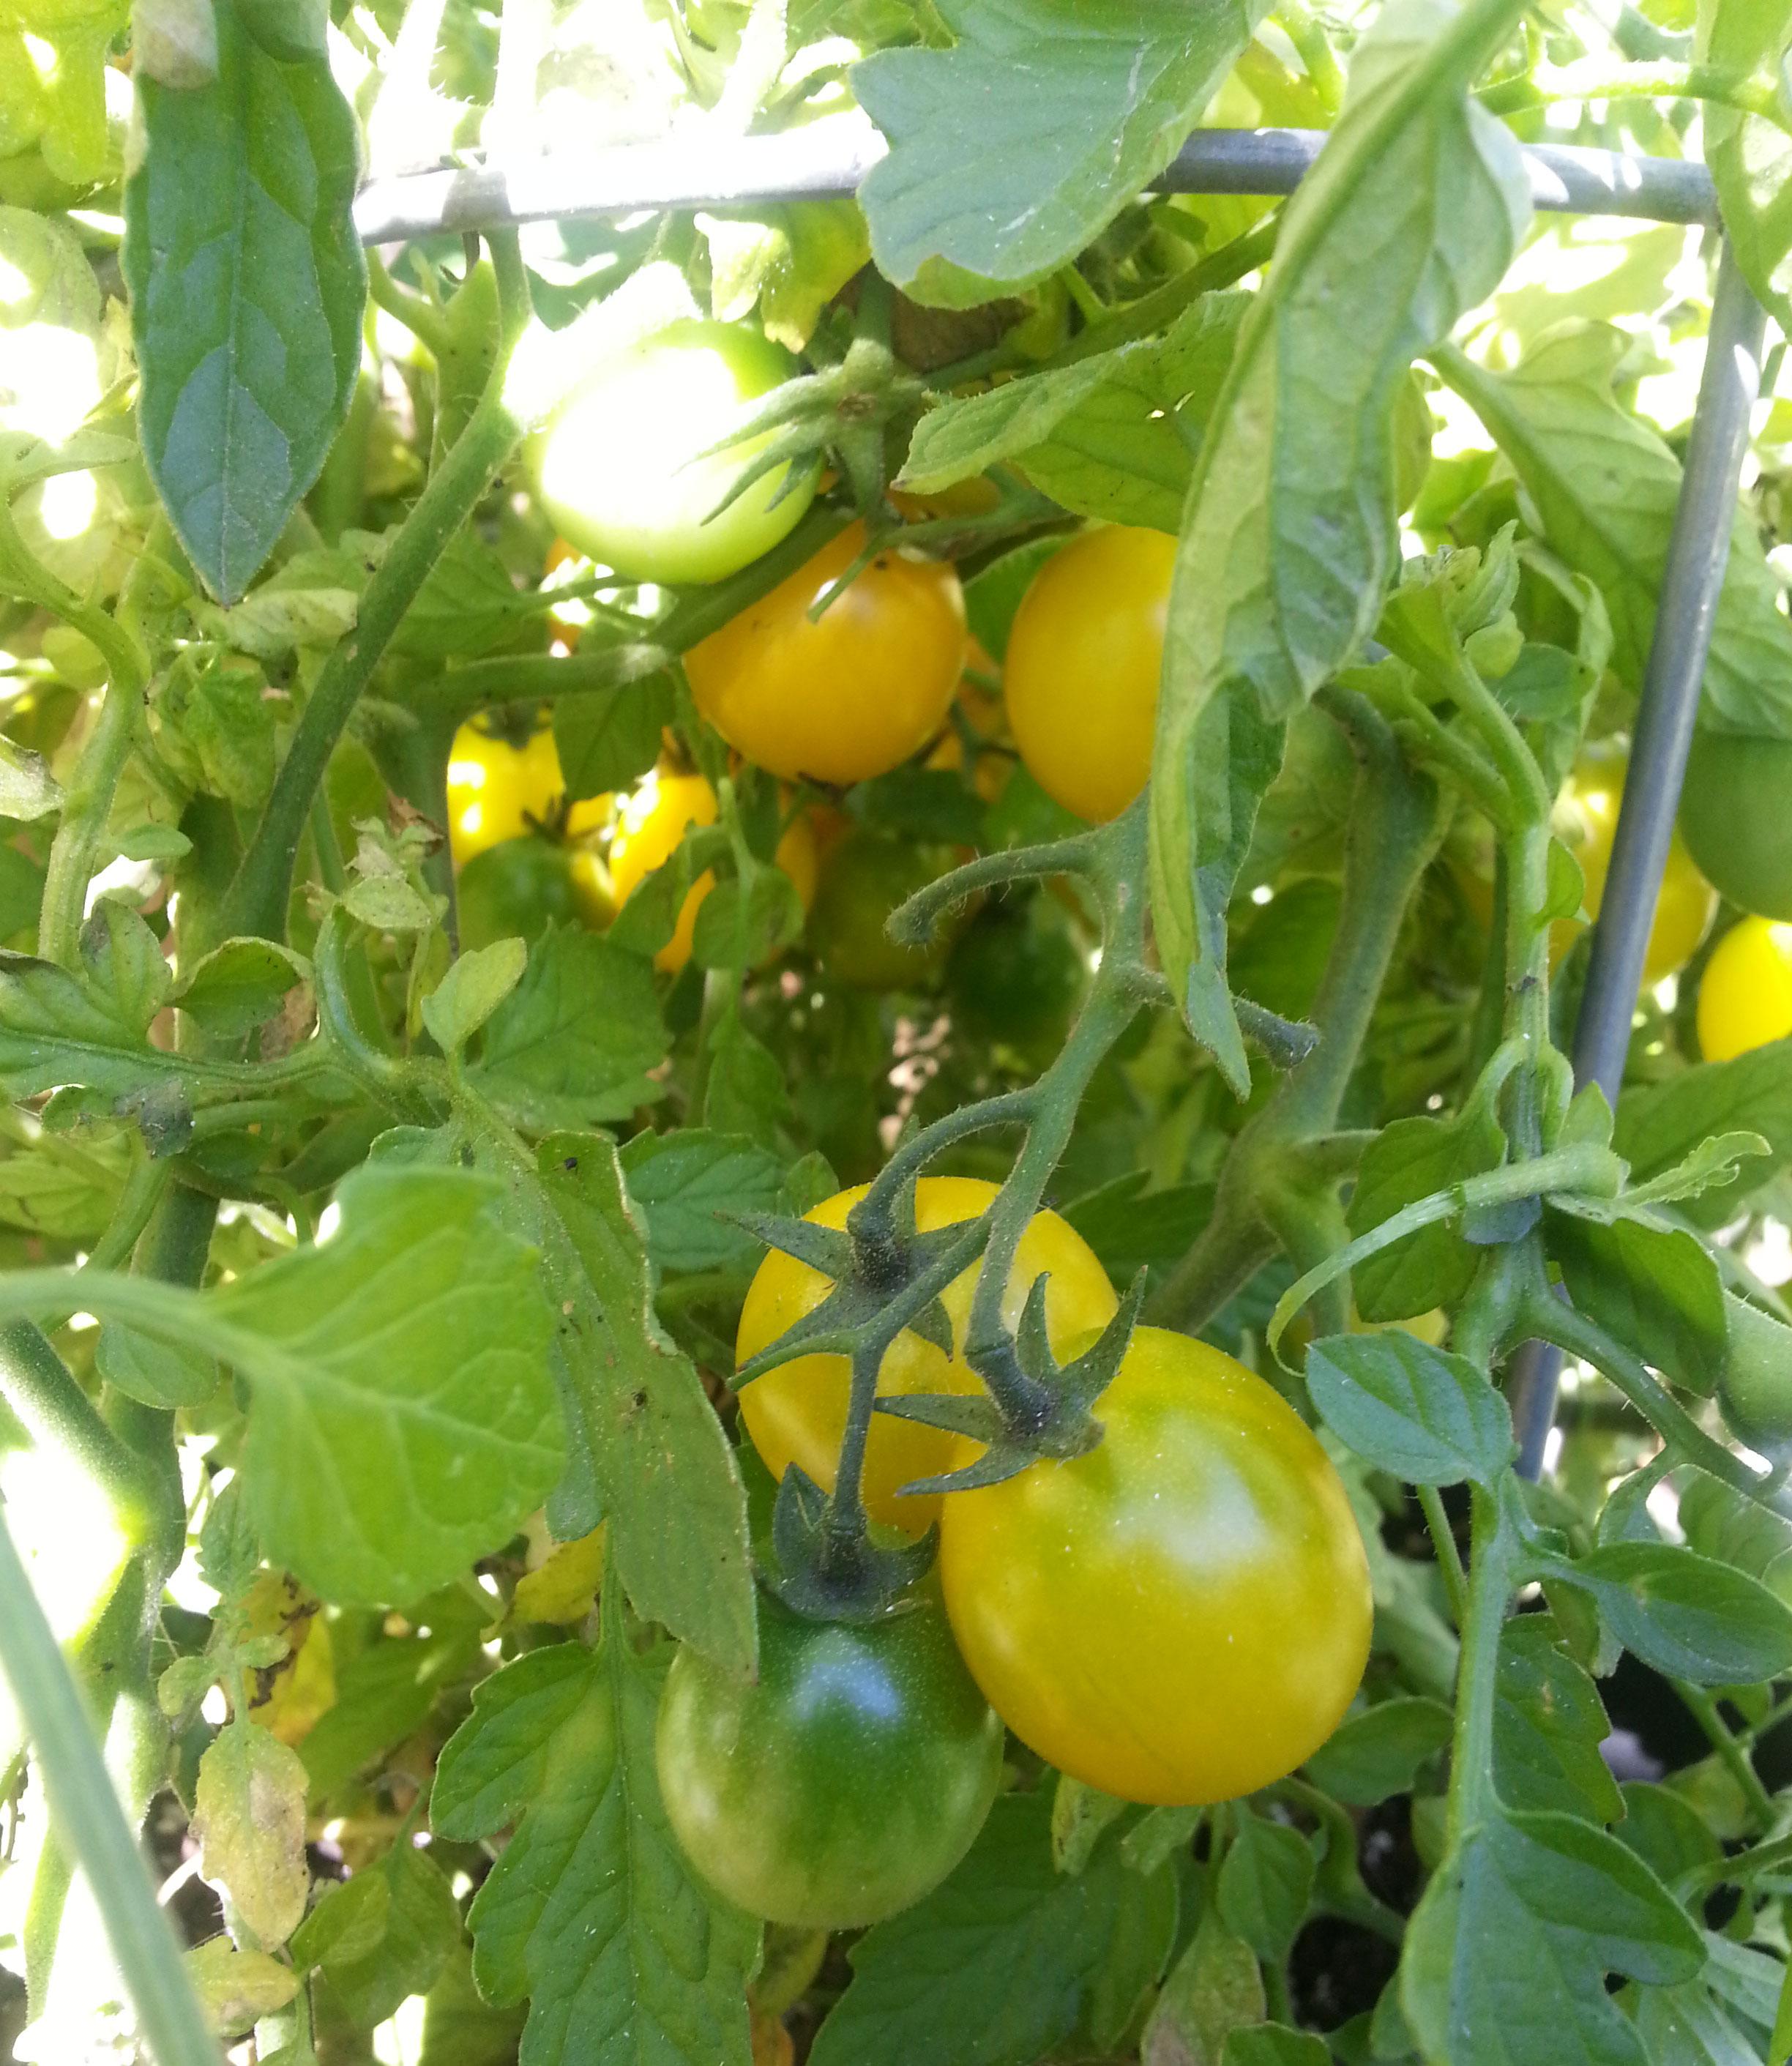 Tomatoes from Wanda's Garden